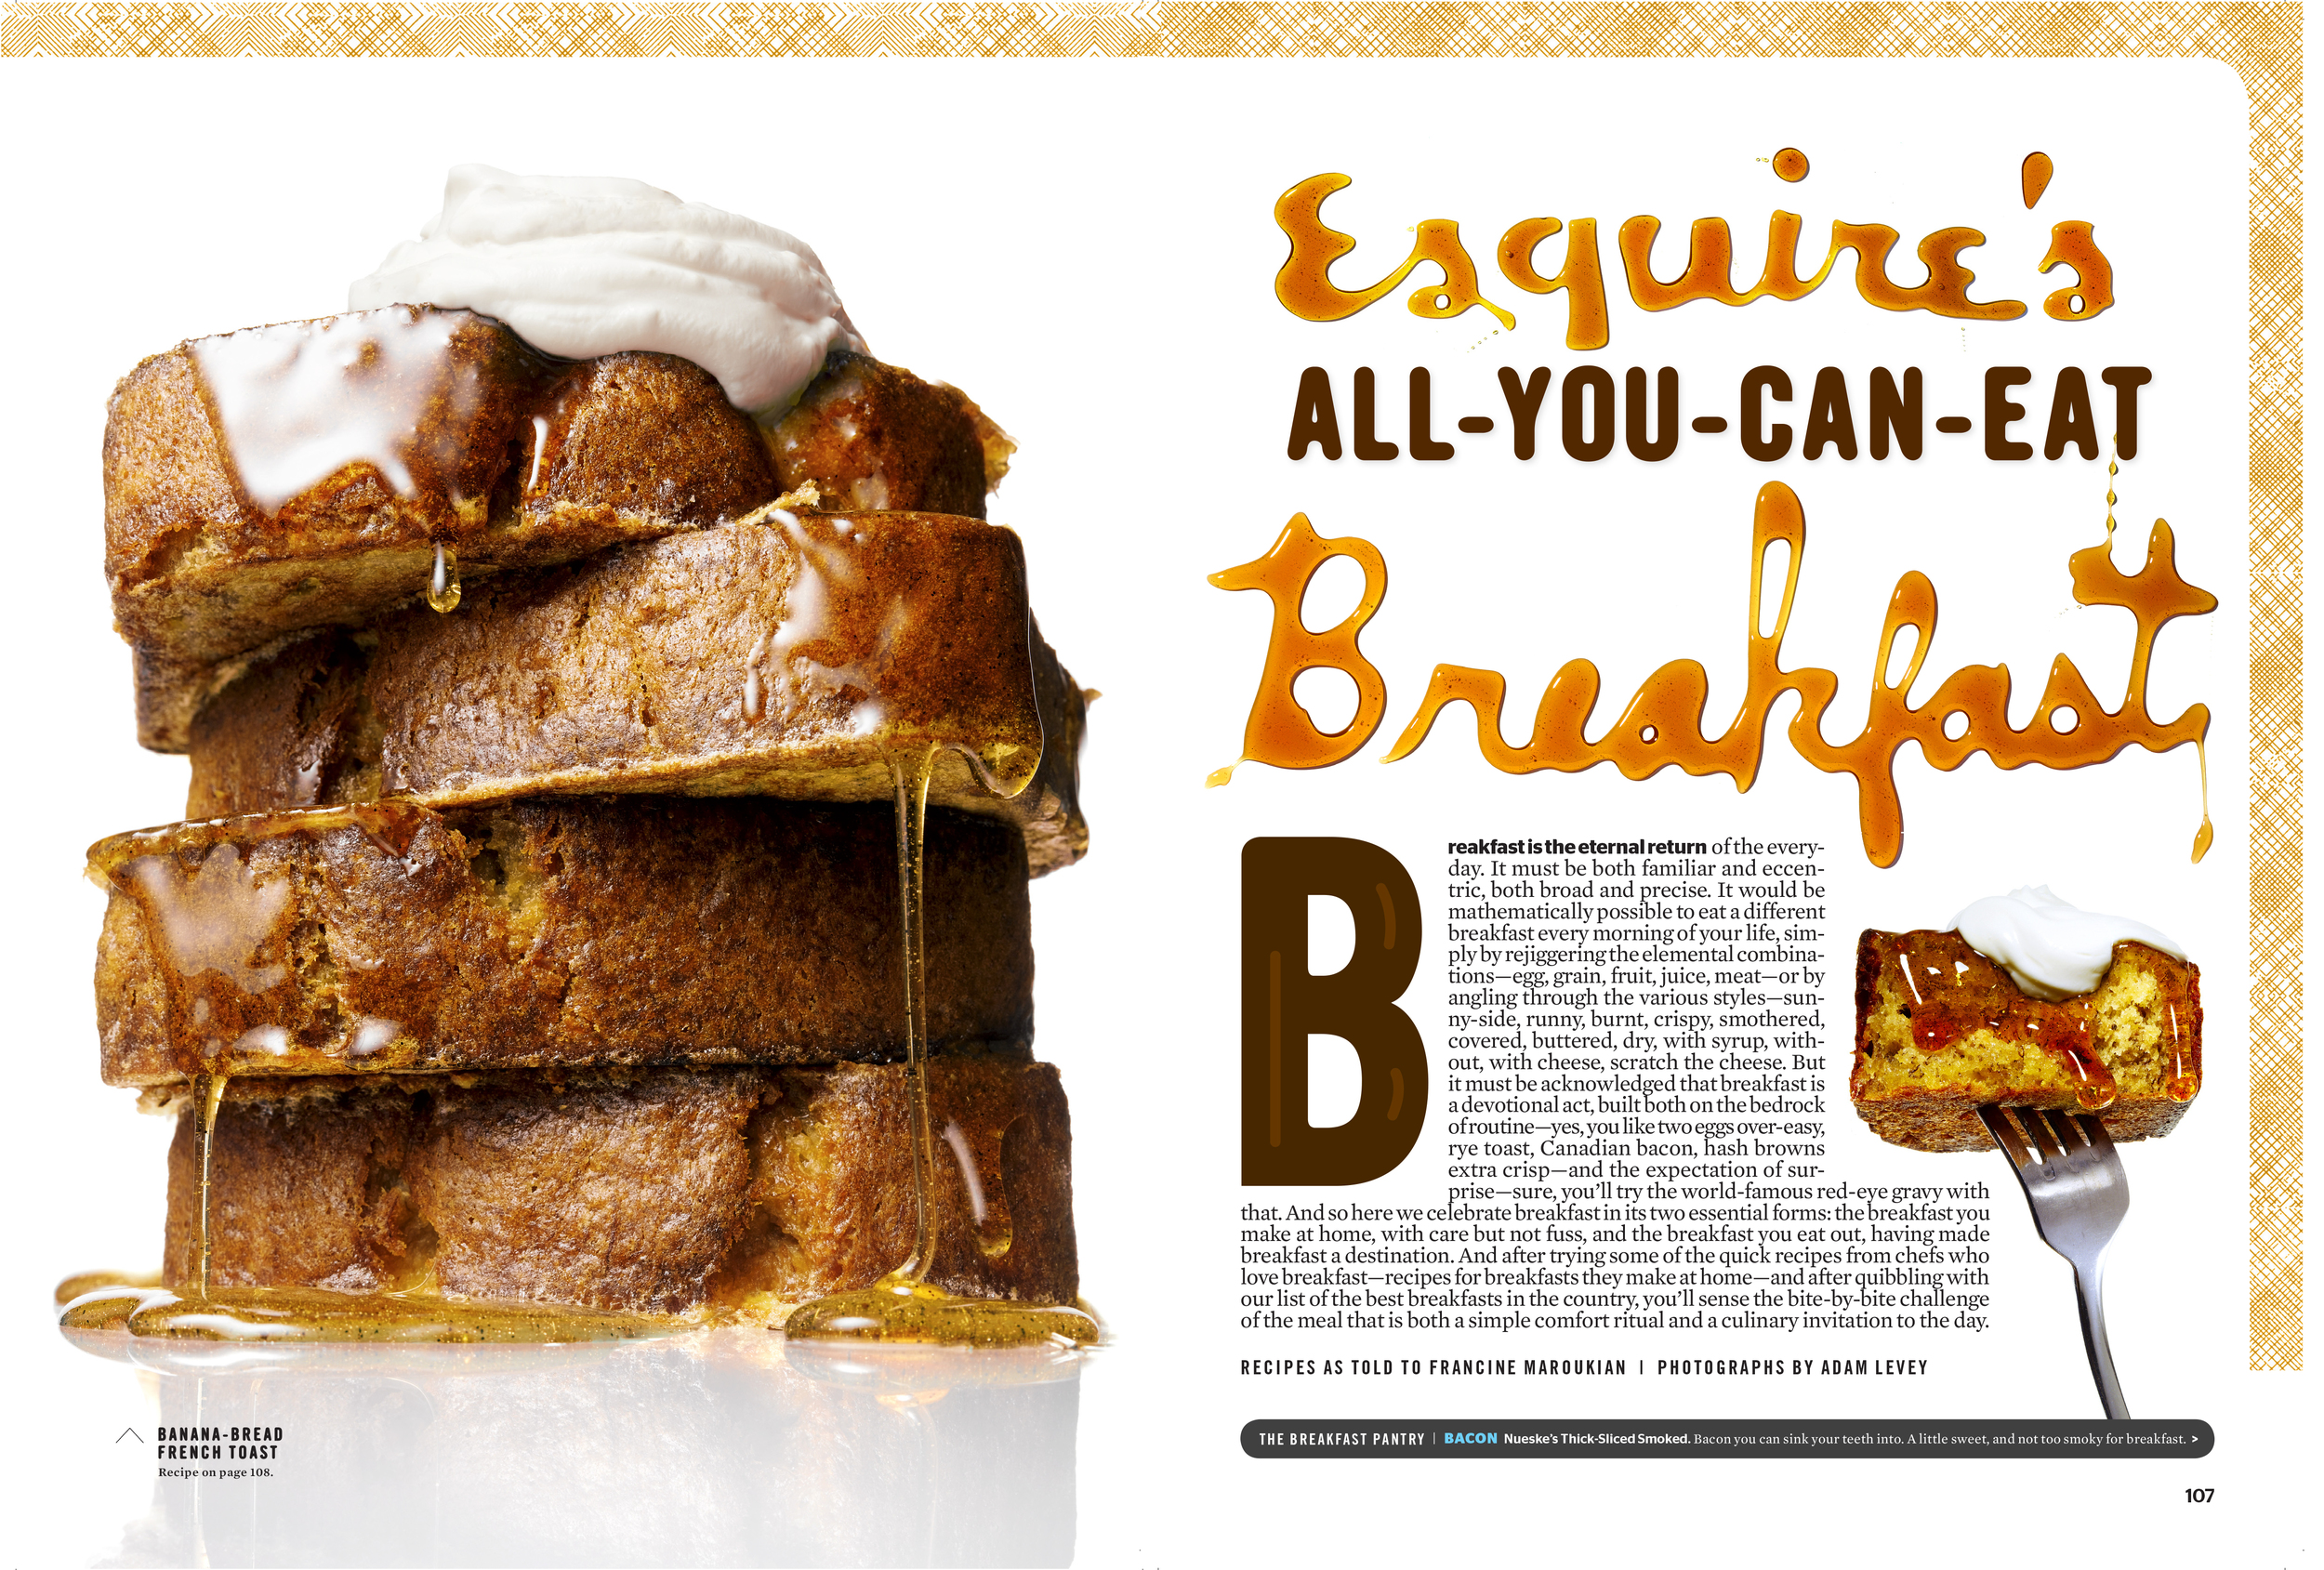 BreakfastLEVEY.jpg